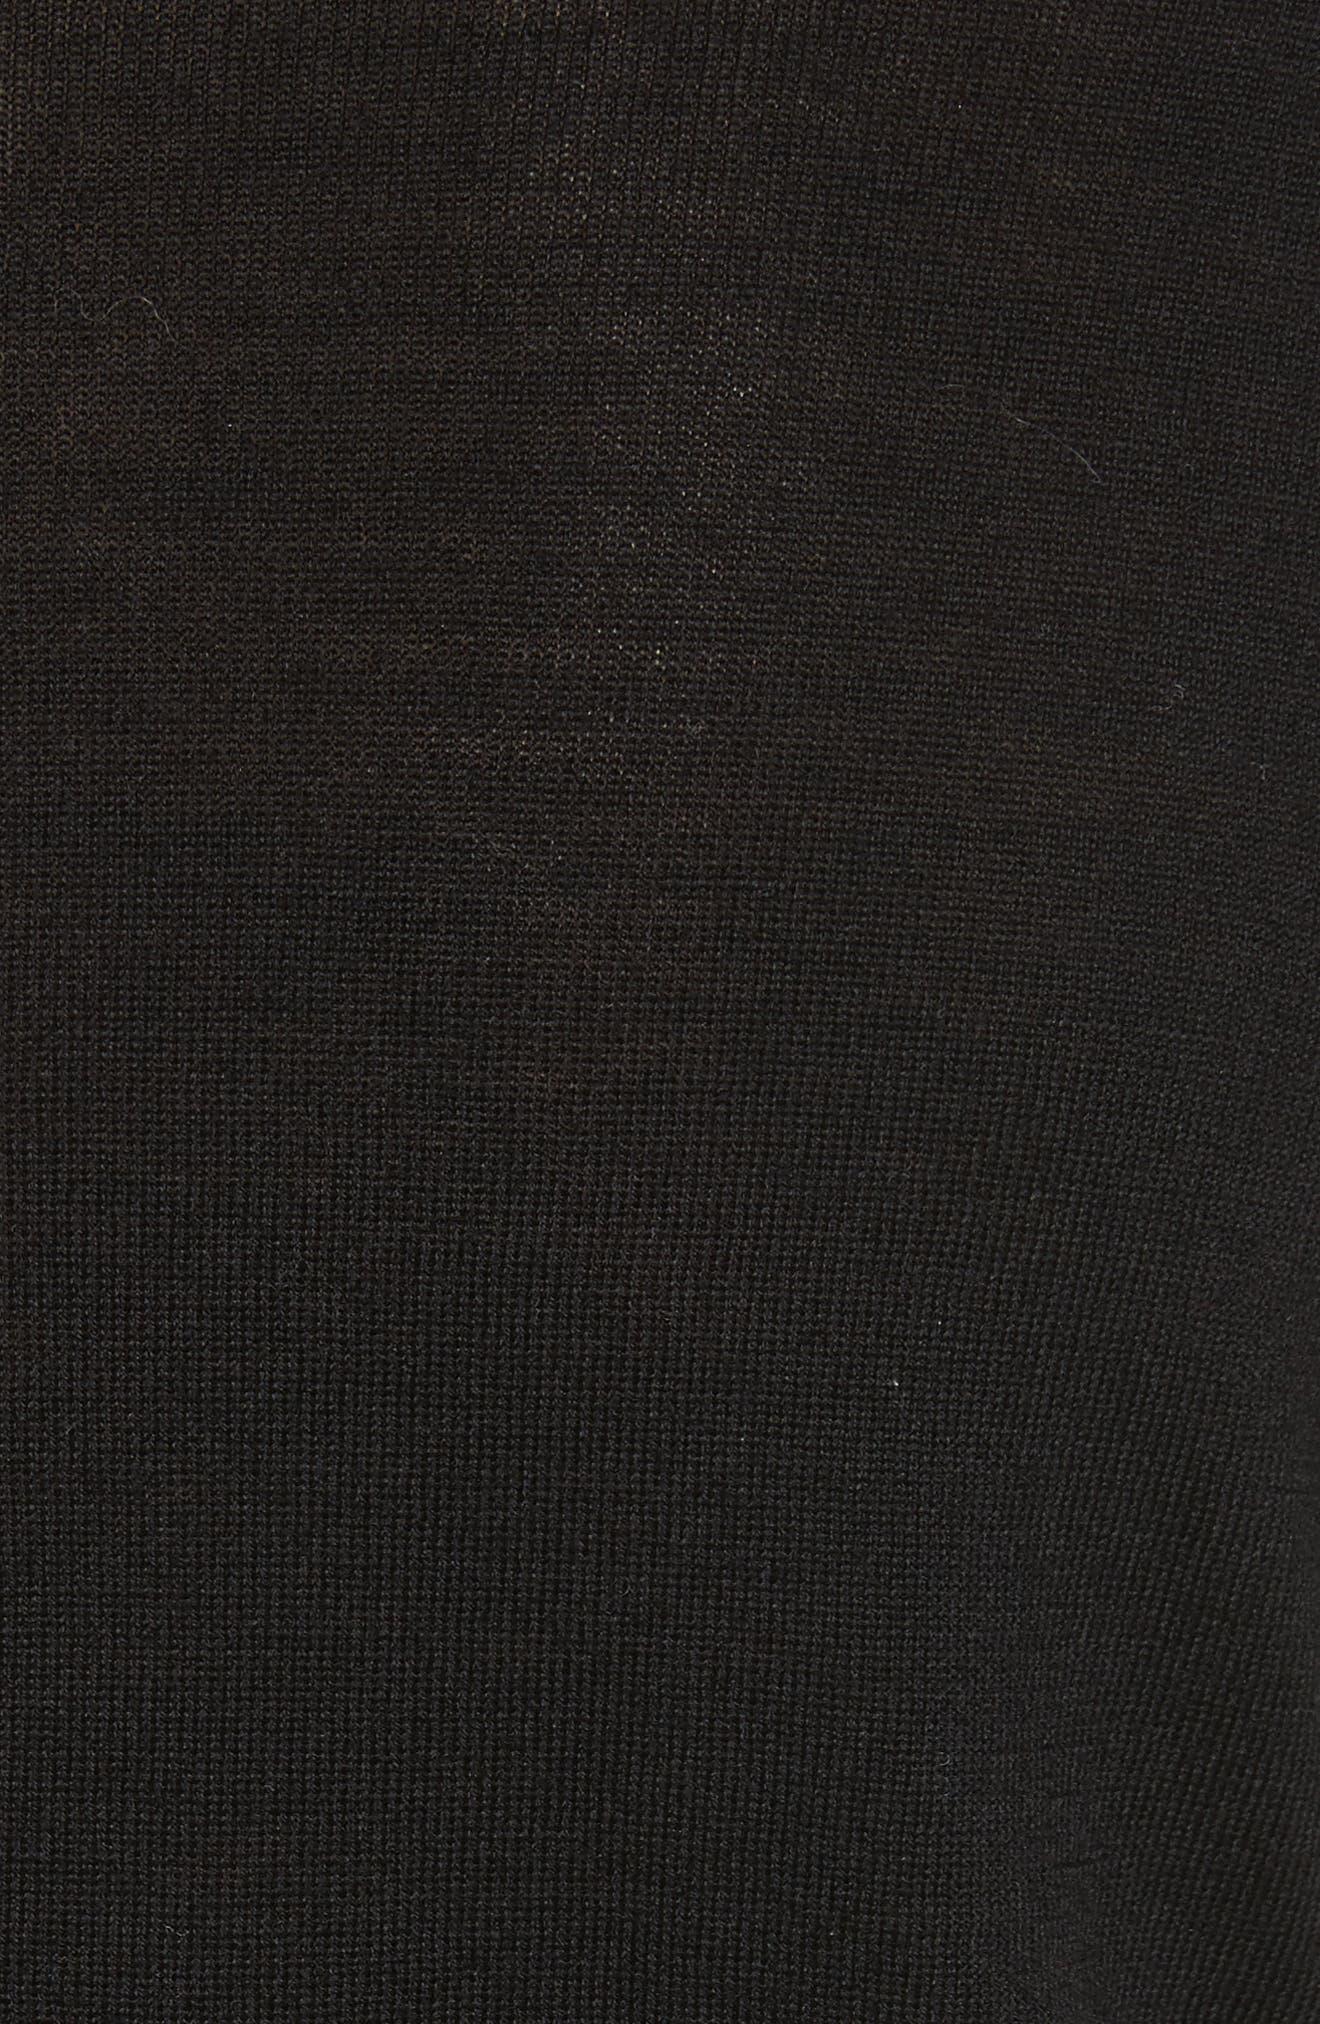 Sadie Merino Wool Blend & Silk Sweater,                             Alternate thumbnail 6, color,                             Black